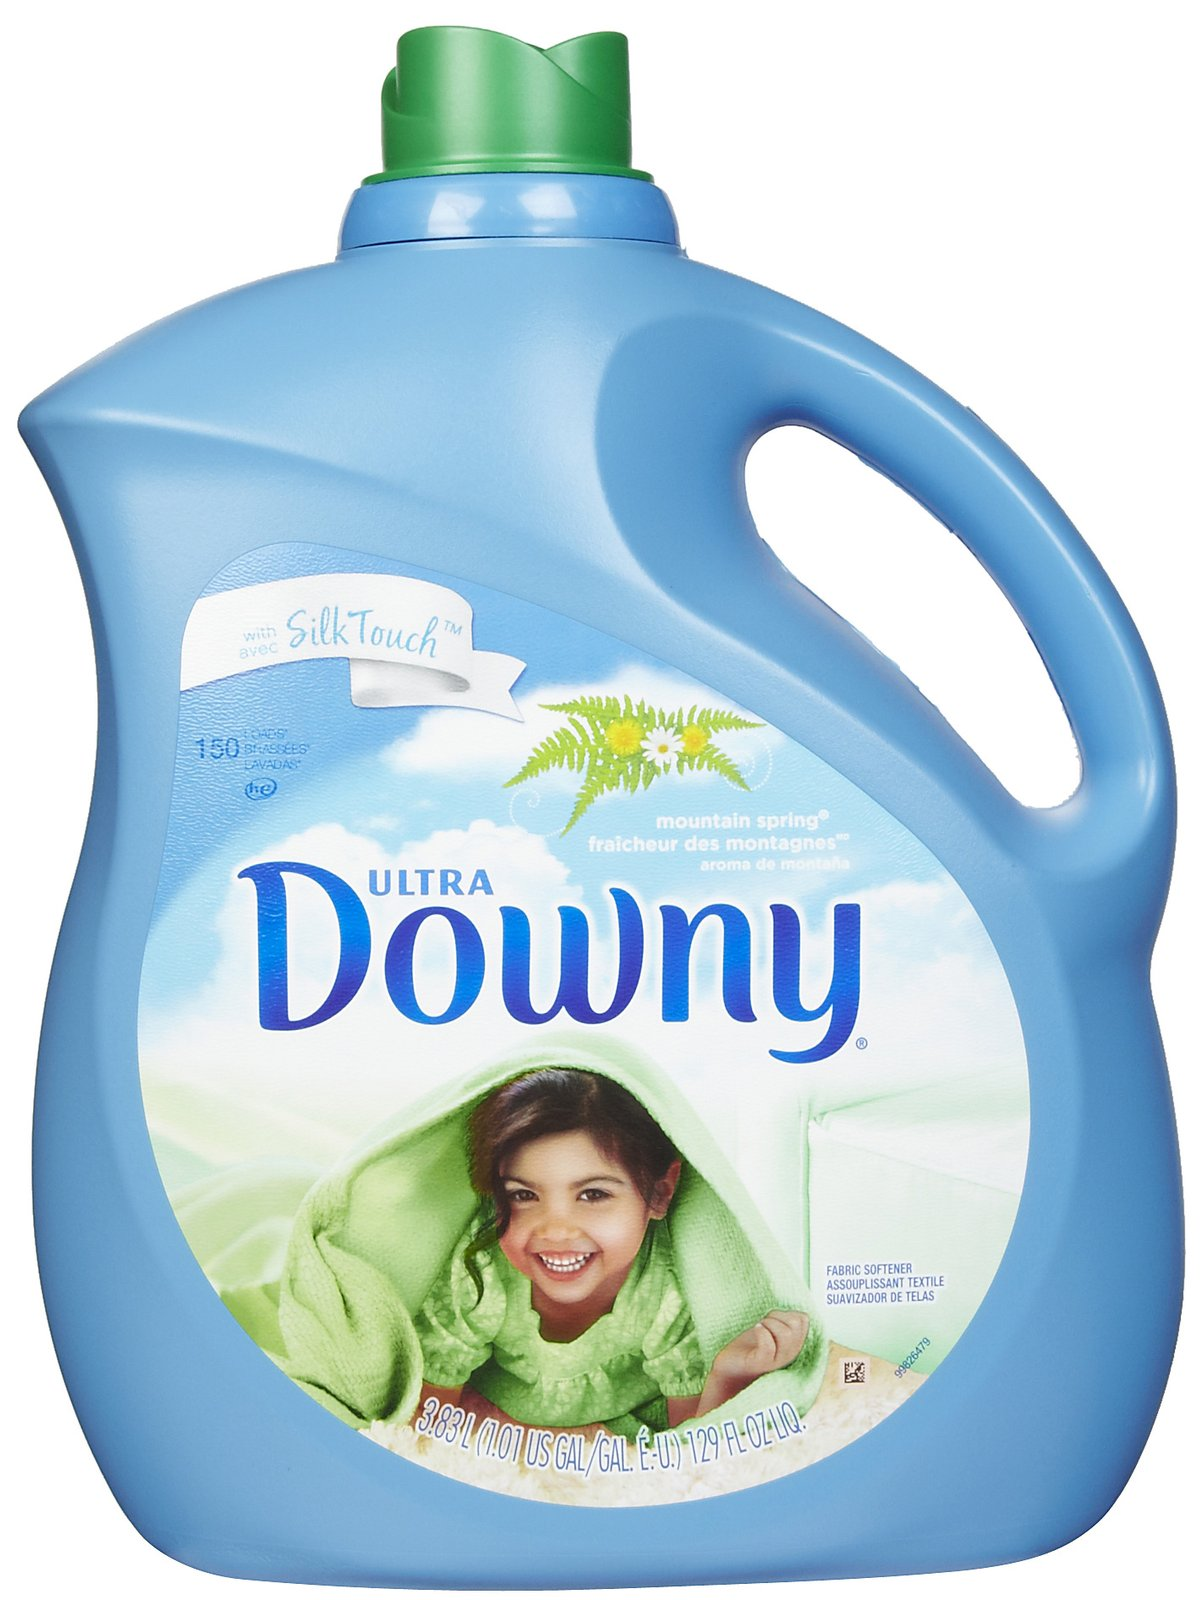 Downy Ultra Liquid Fabric Softener, Mountain Spring